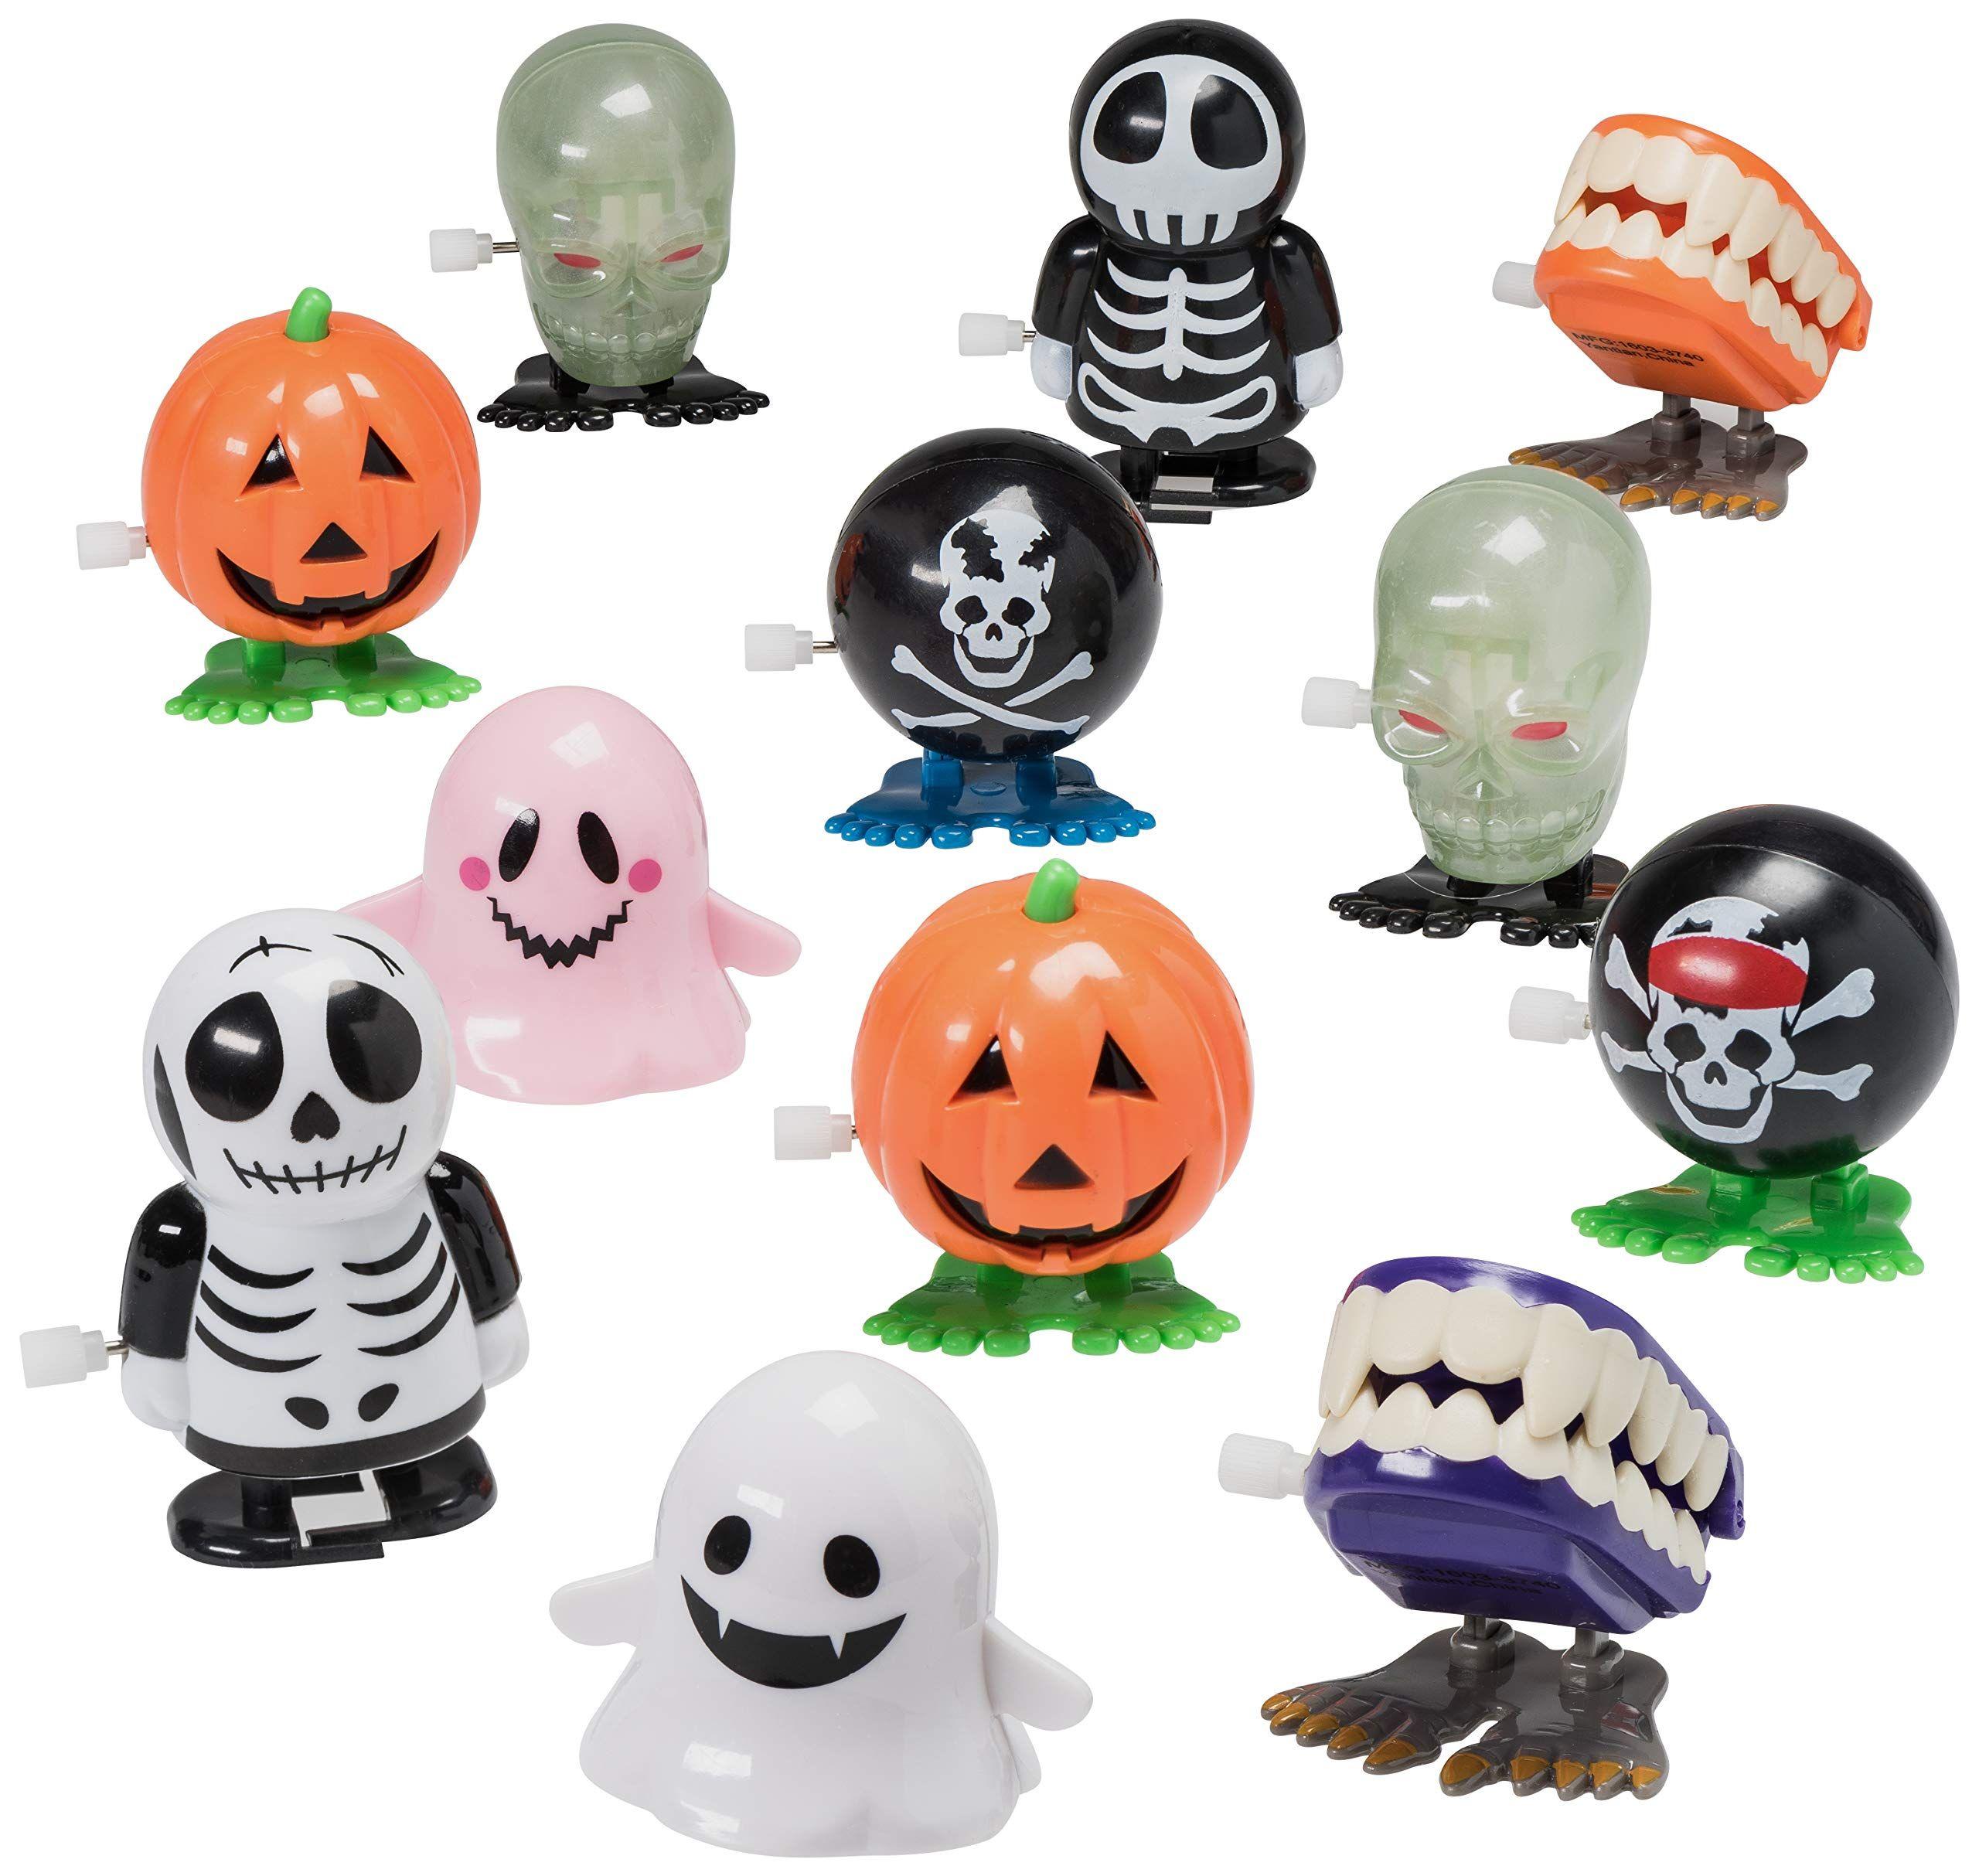 Prextex Halloween Goody Bag Wind Up Toys 12 Pack Halloween